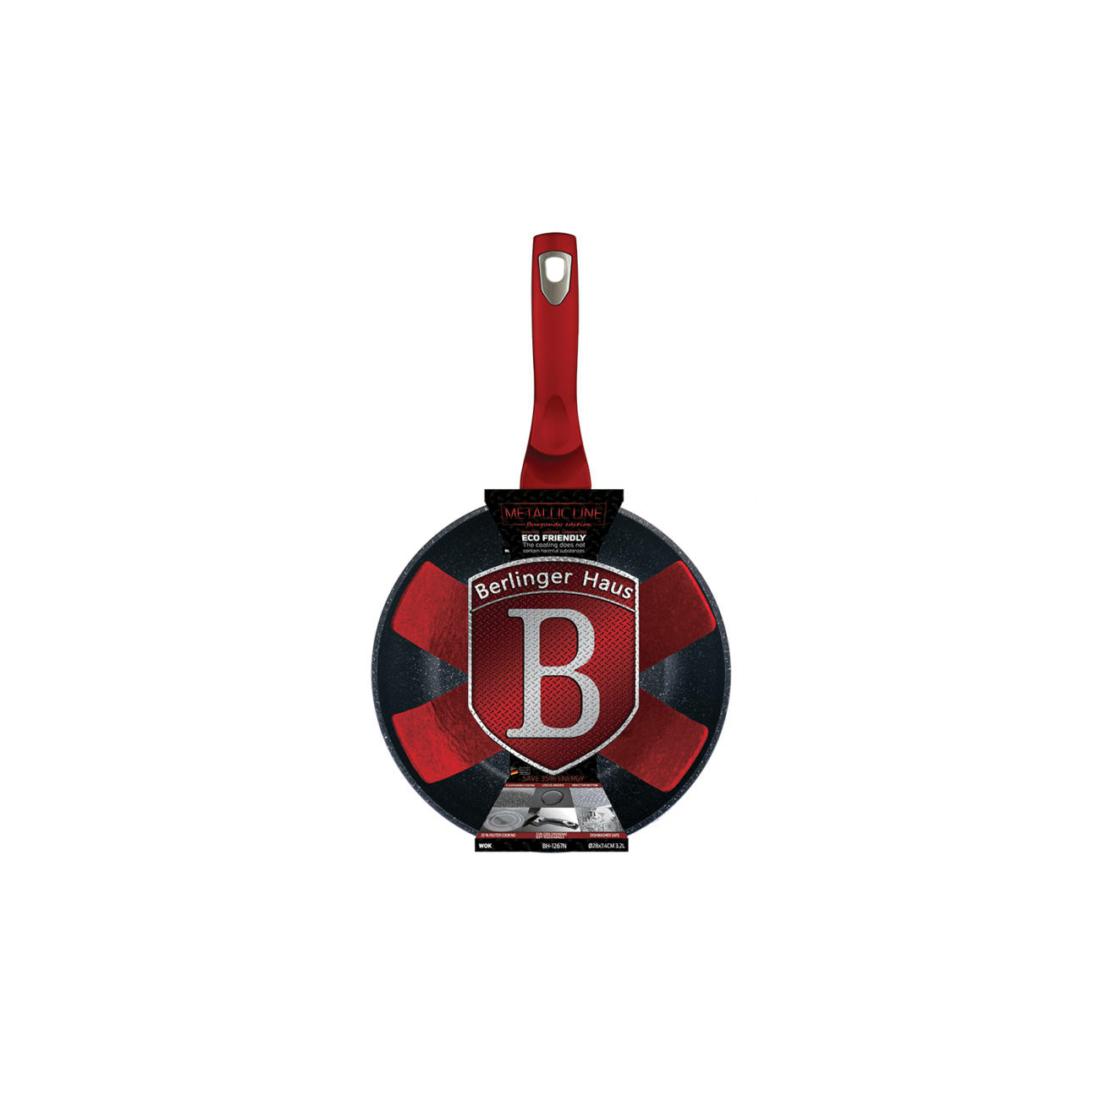 Berlinger Haus Wok Burgundy Metallic Line serpenyő 28 cm